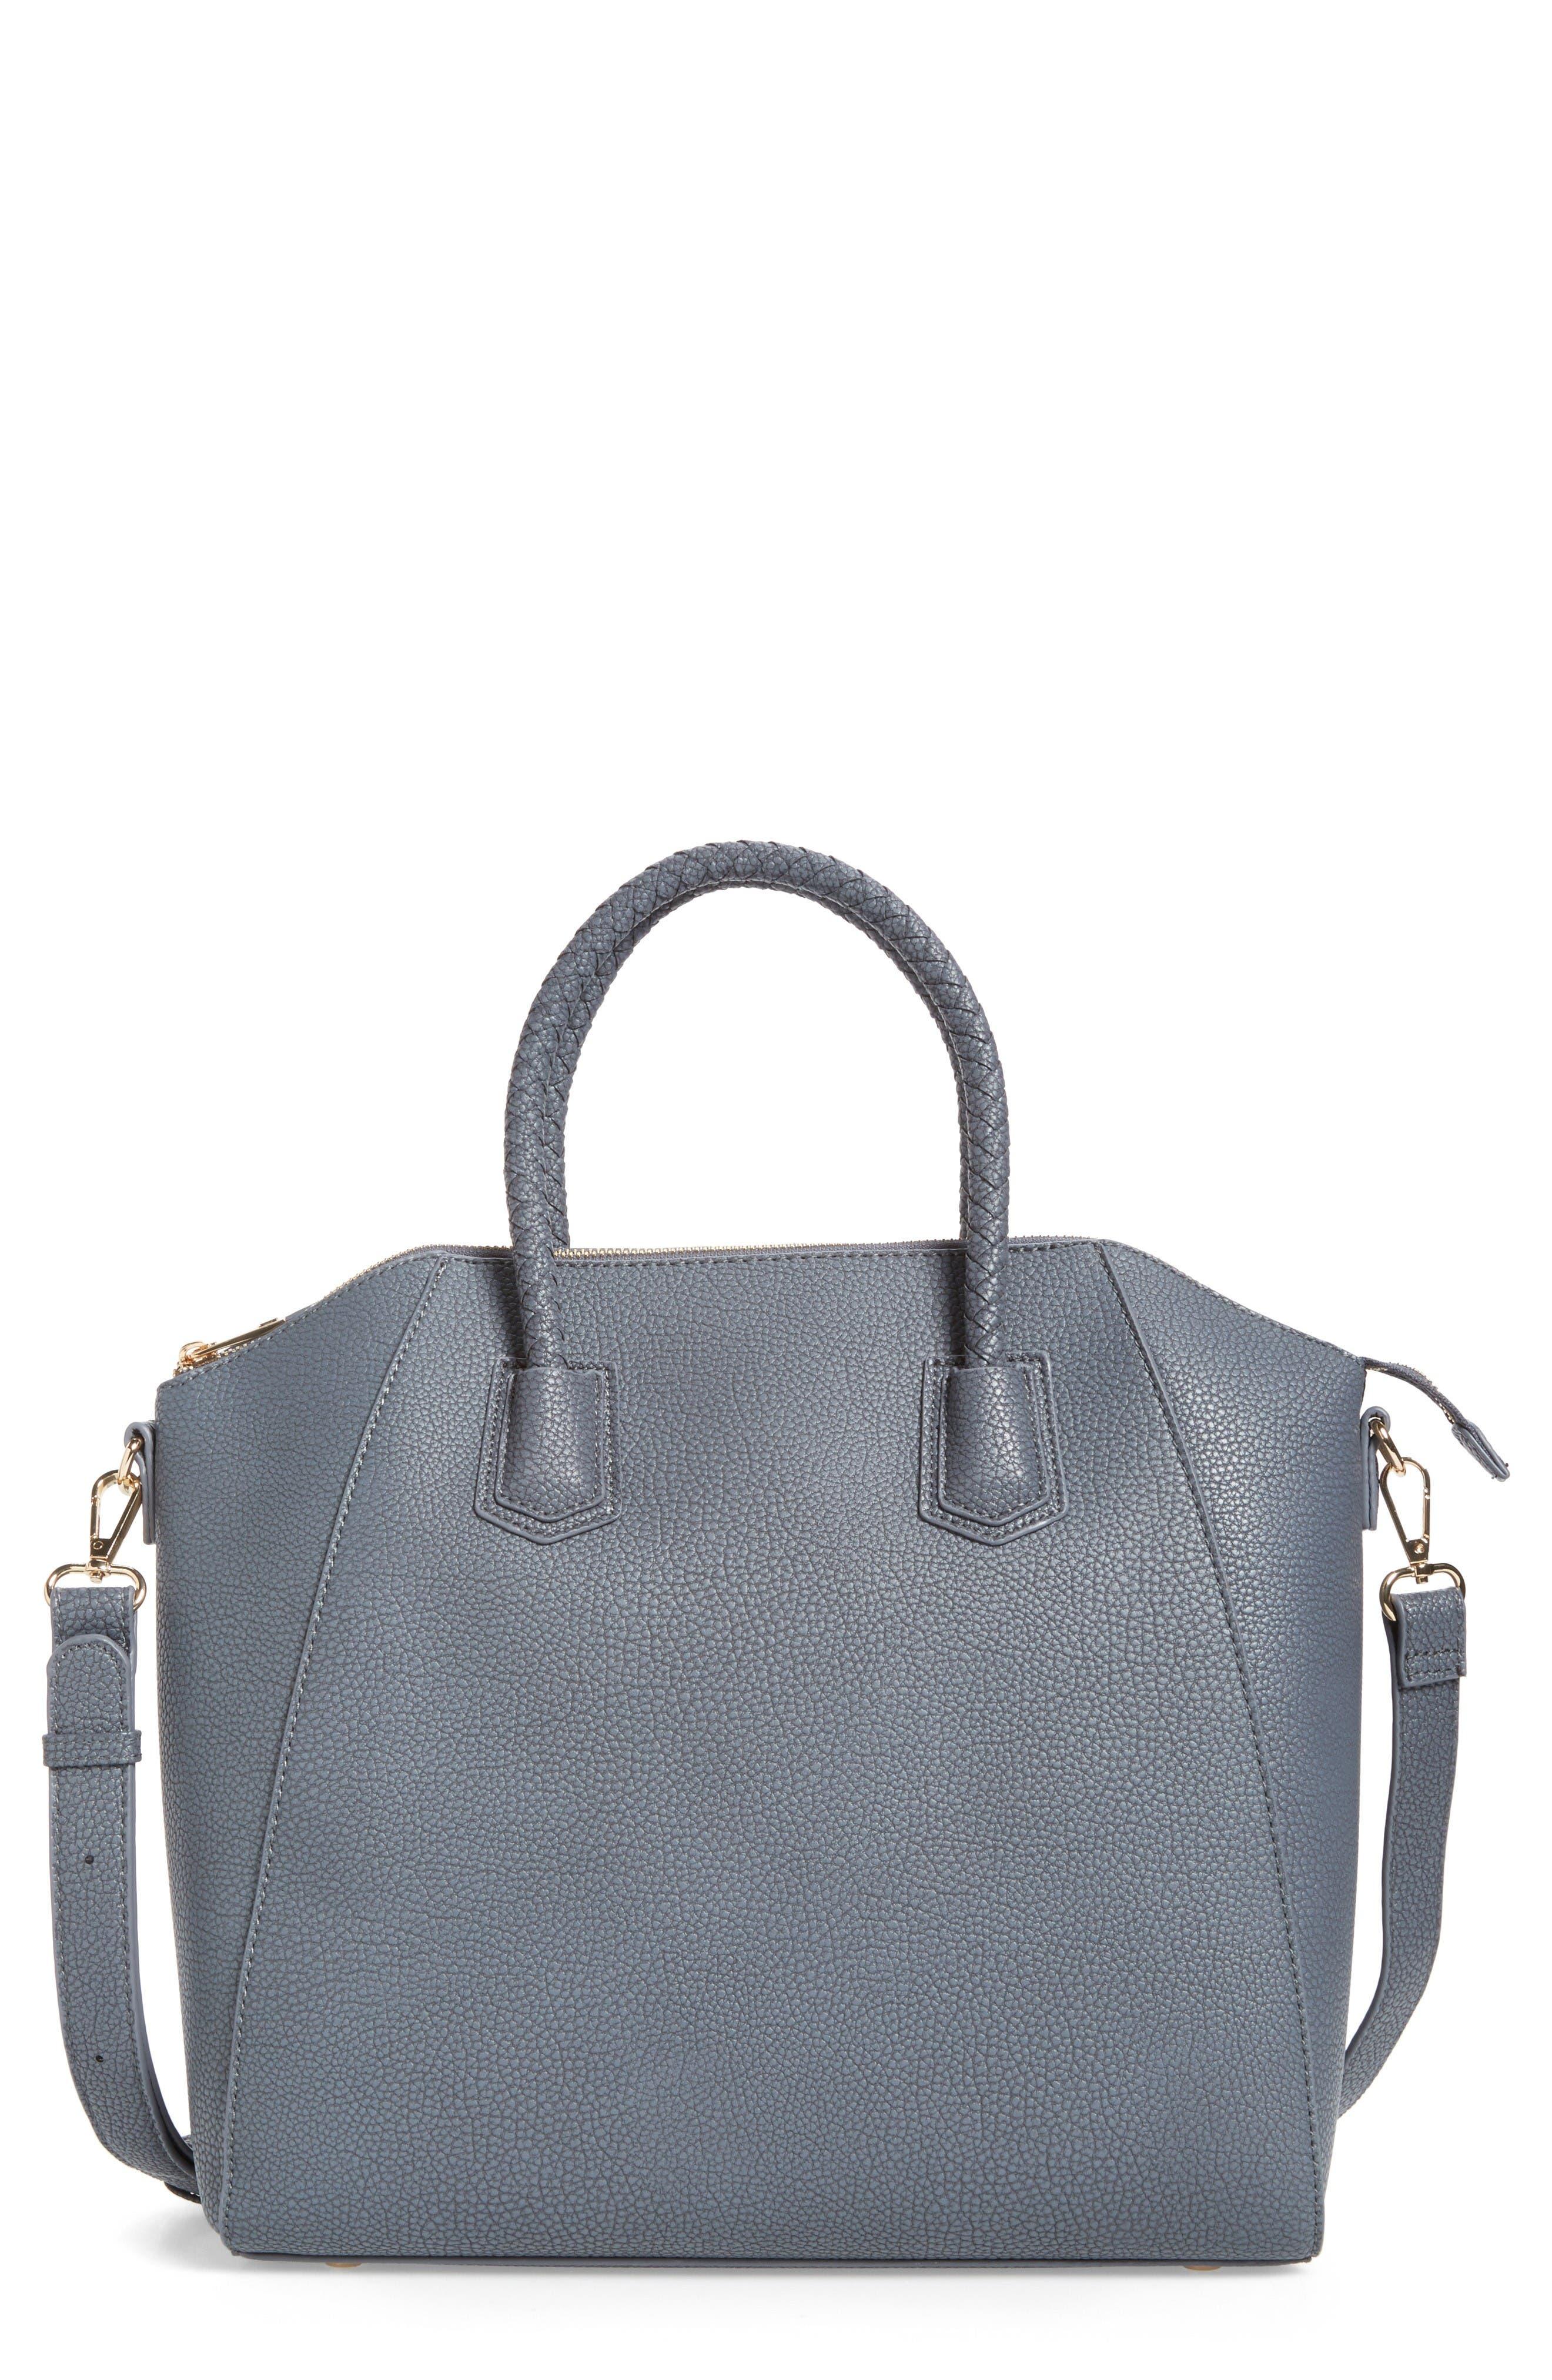 Main Image - Sole Society Giada Braided Faux Leather Satchel